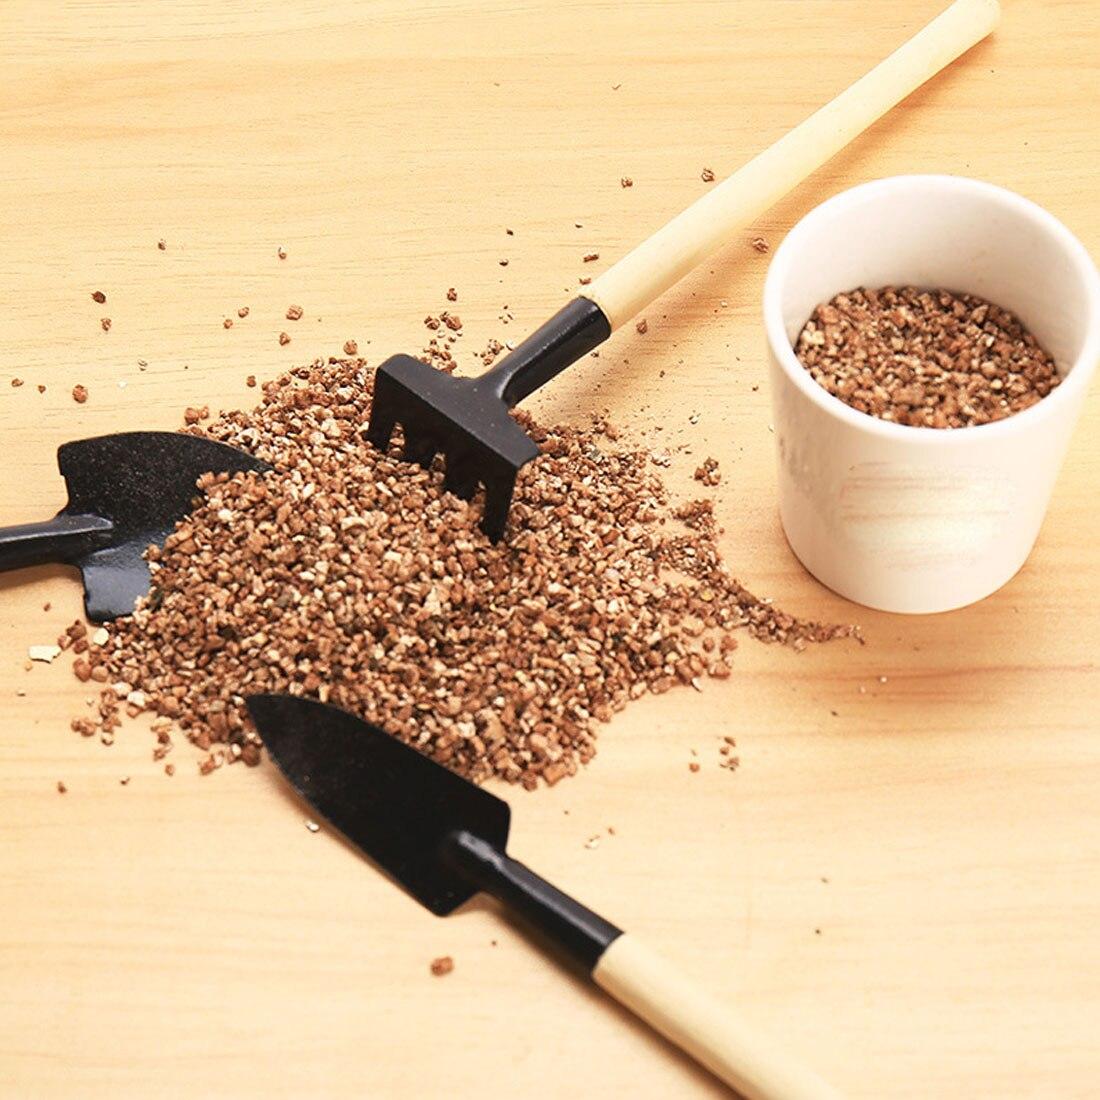 Children Harrow Shovel Rake Plant Maintenance Wooden Handle Garden Tool Set 3pcs/set Mini Garden Plant Tool Set